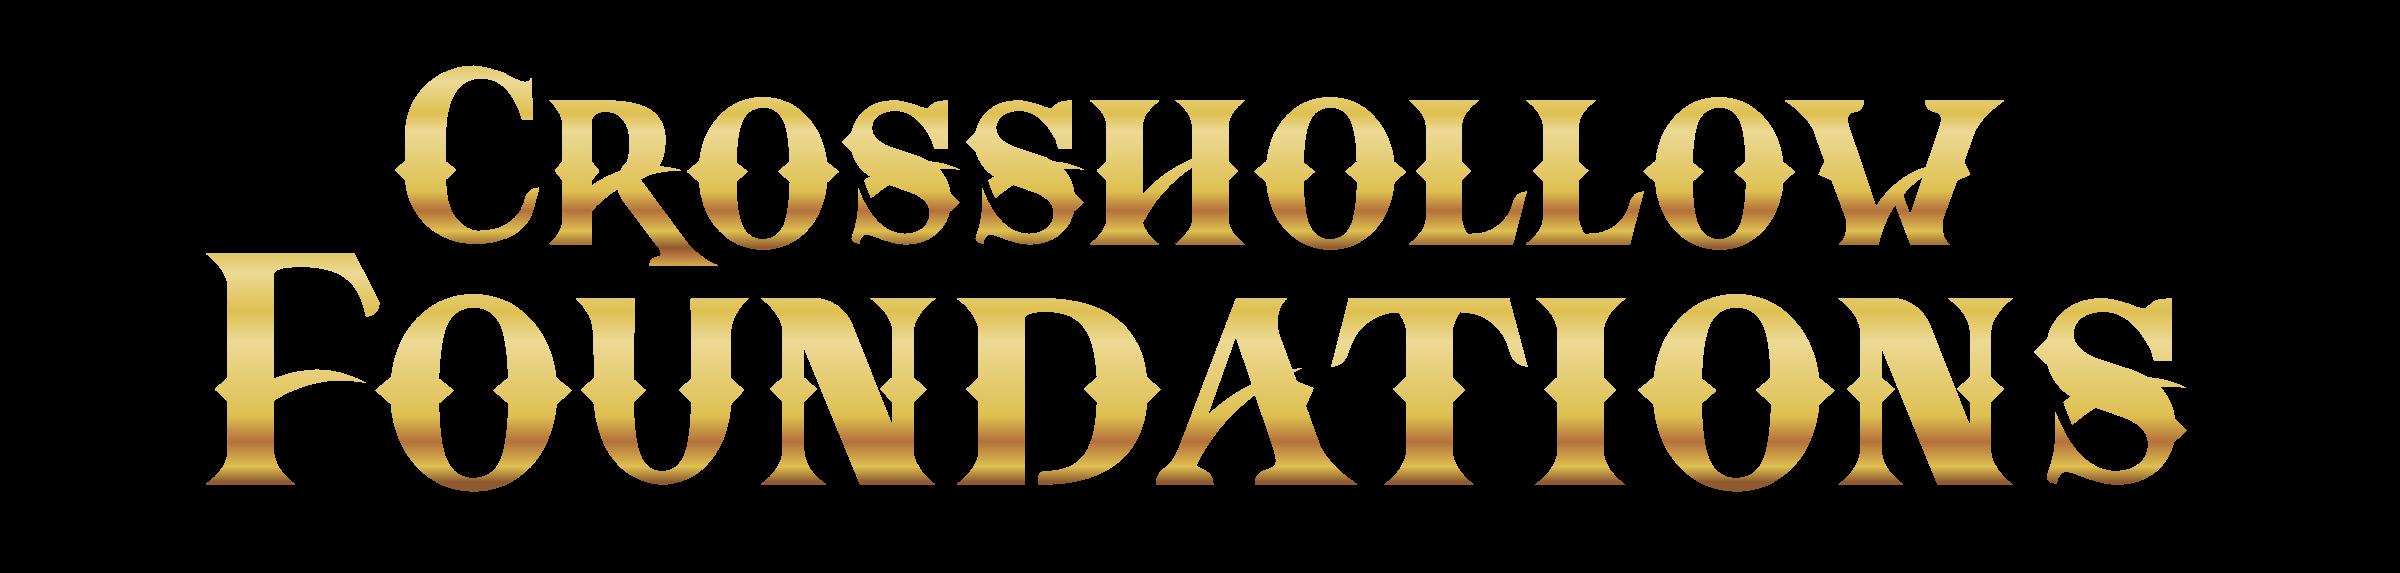 Crosshollow Foundations